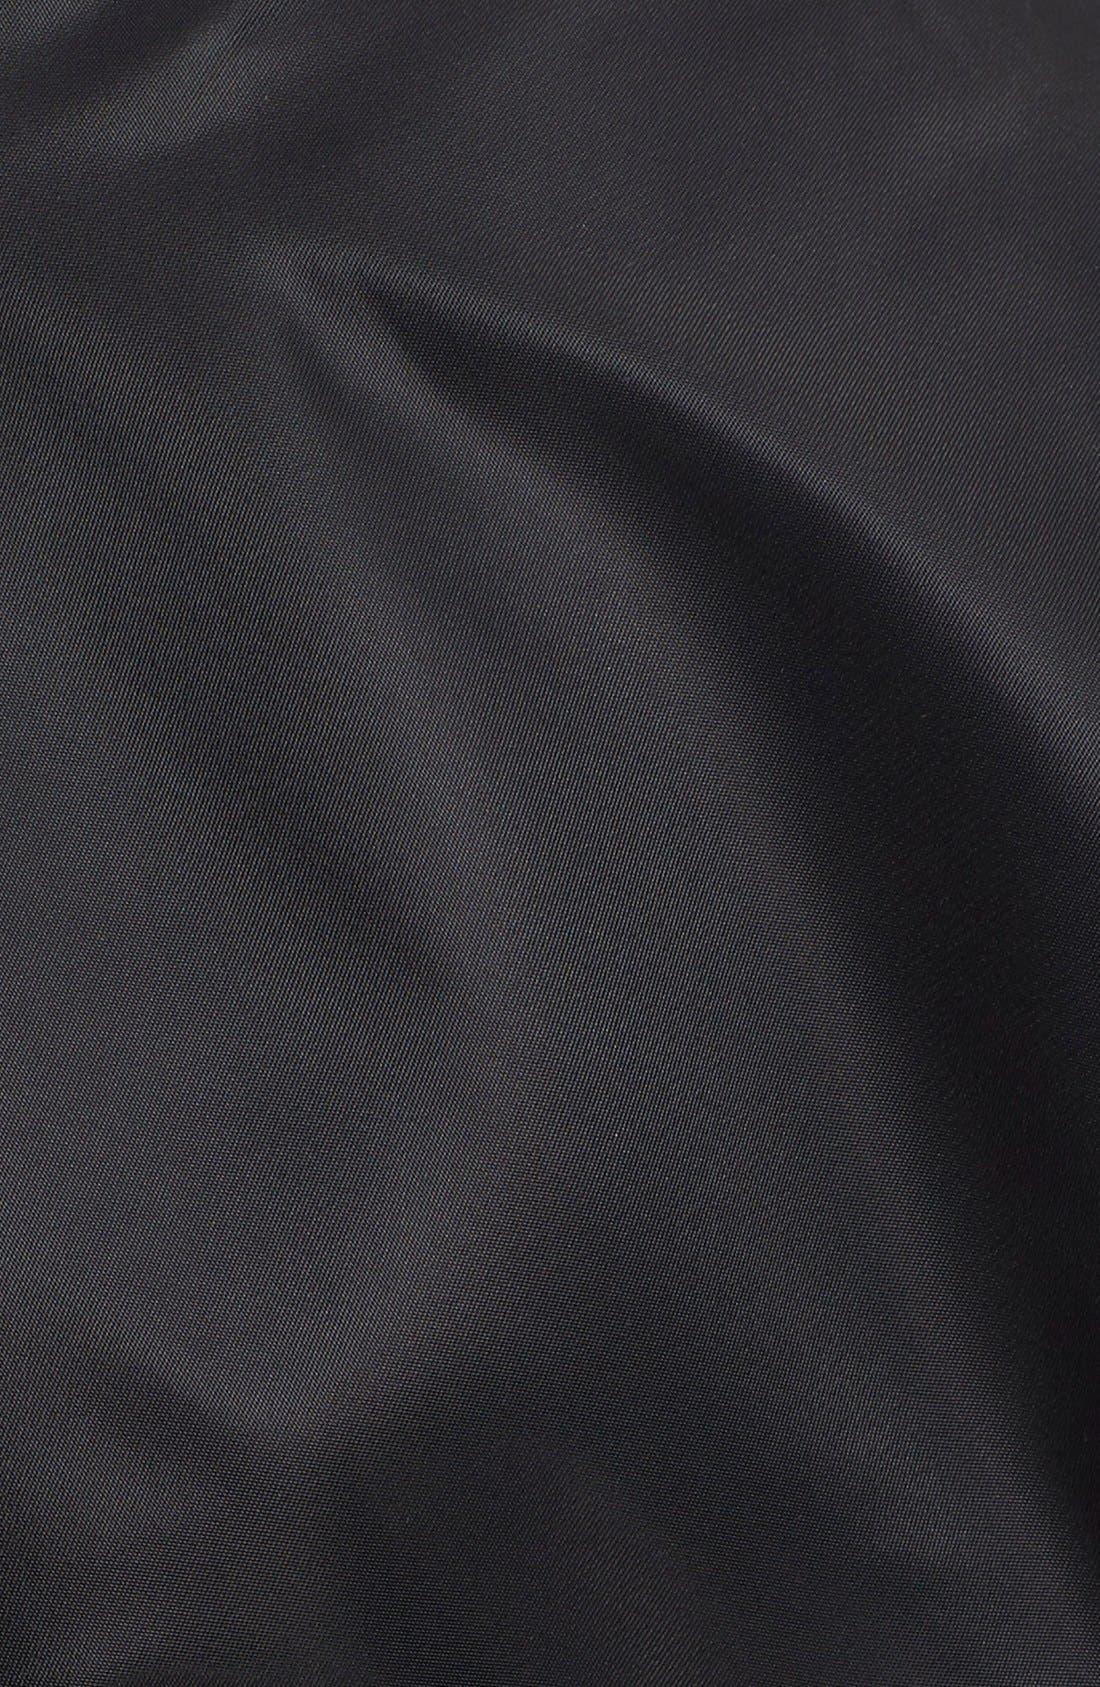 Alternate Image 3  - Vetements Nylon Bomber Jacket